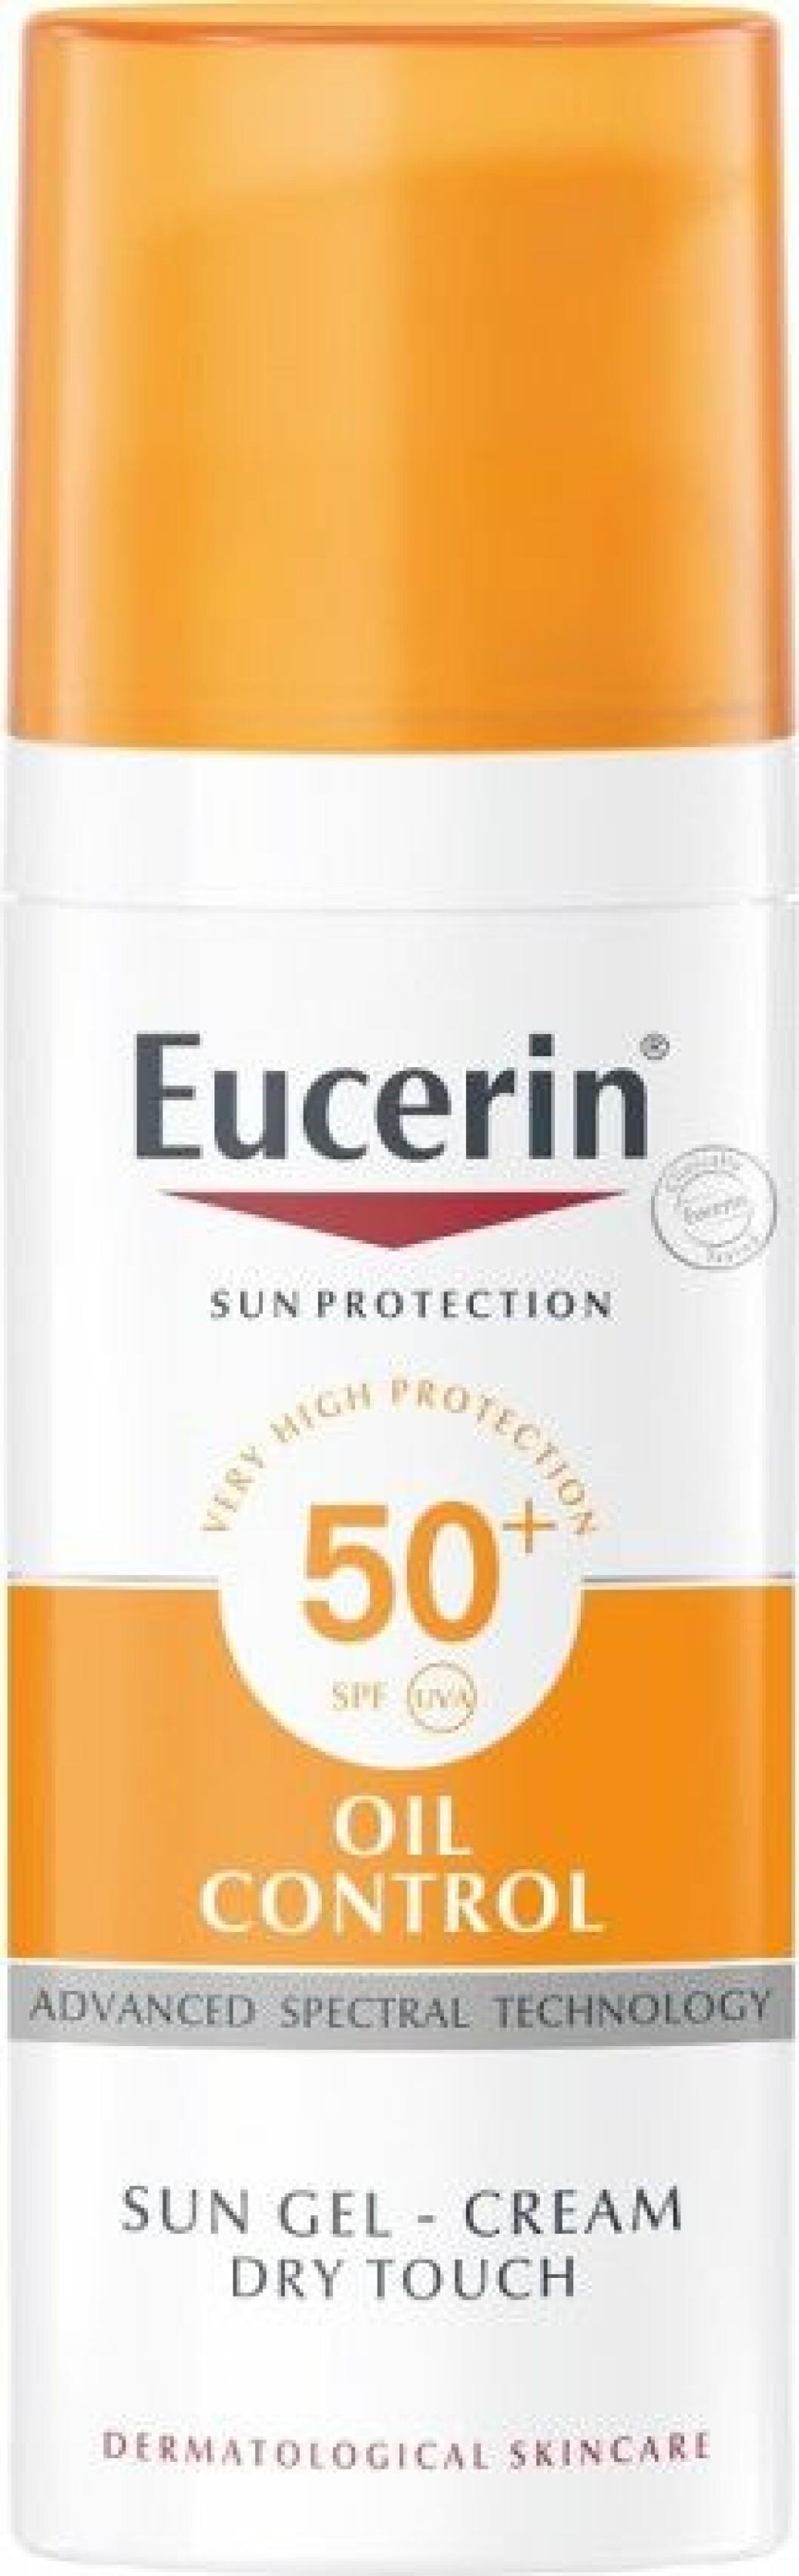 Eucerins Oil control SPF 50